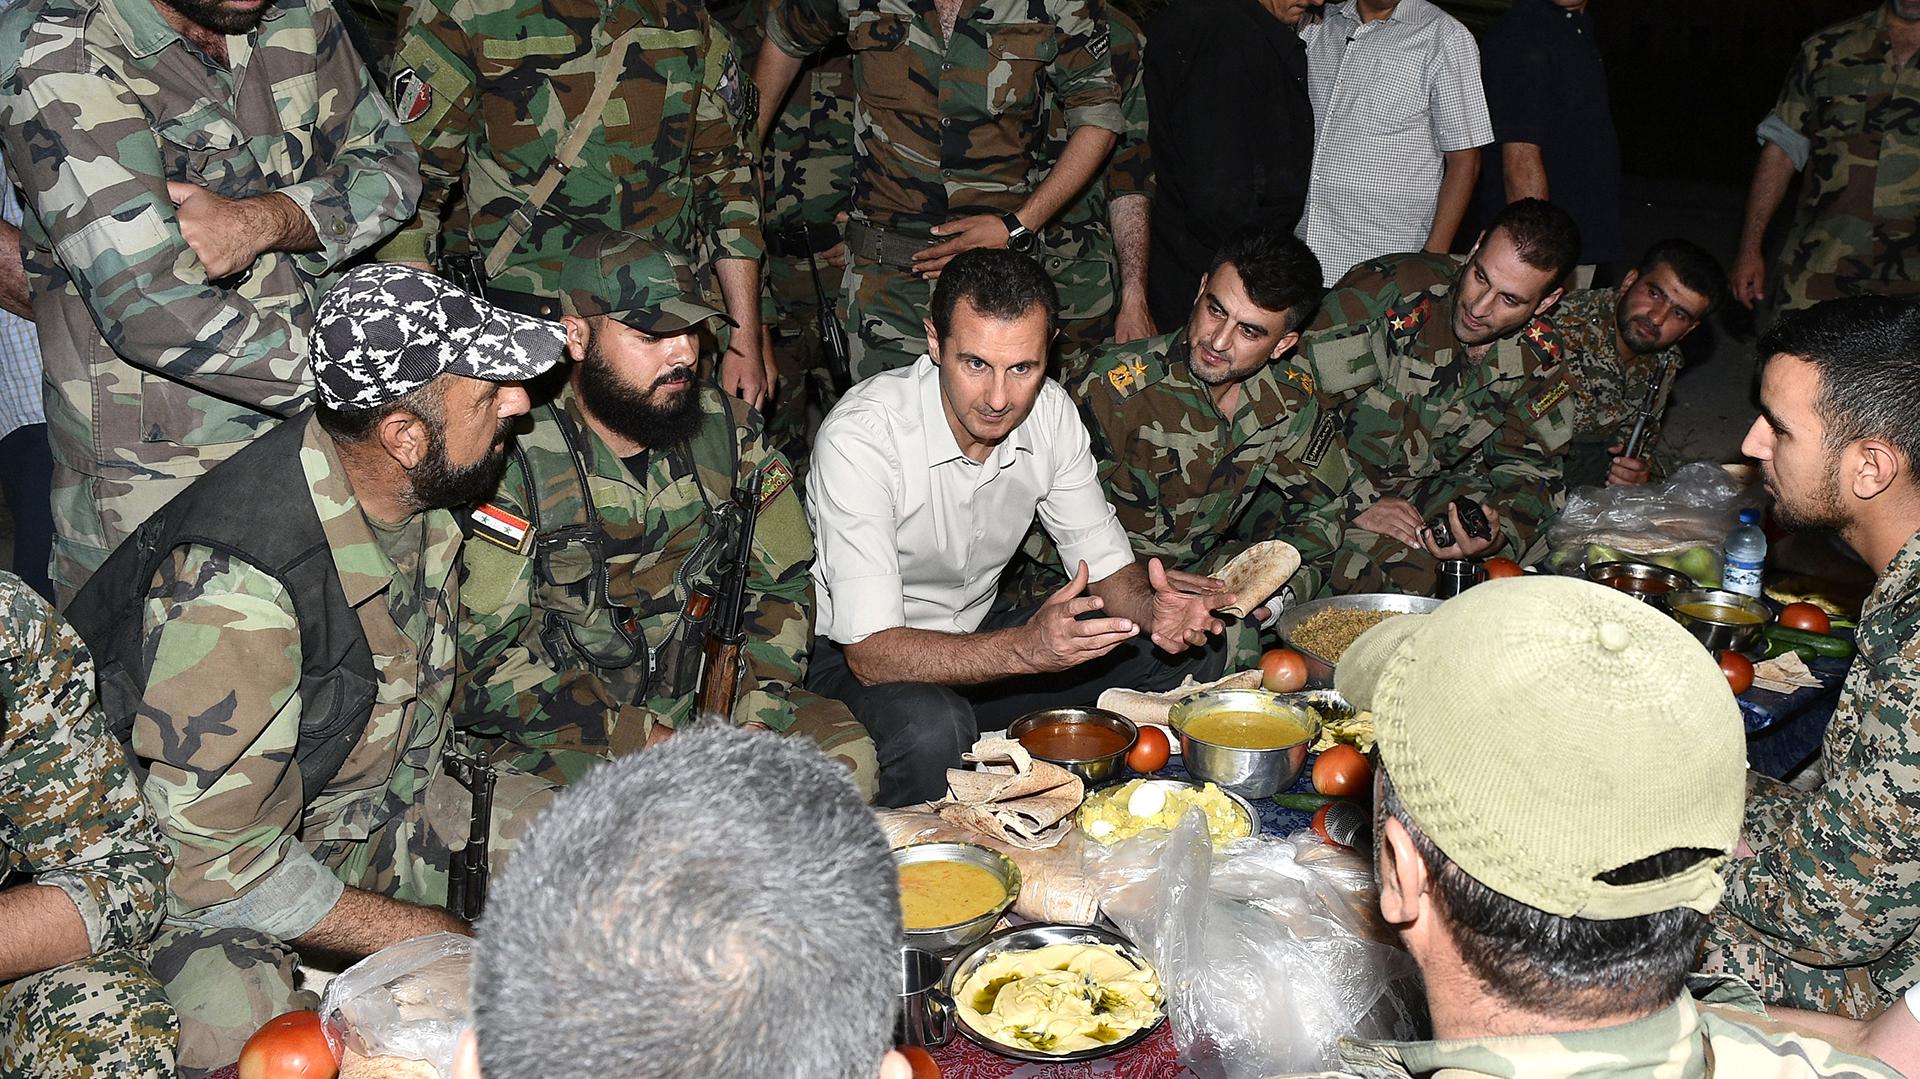 El dictador Bashar Al Assad junto a tropas sirias (Reuters / Archivo)